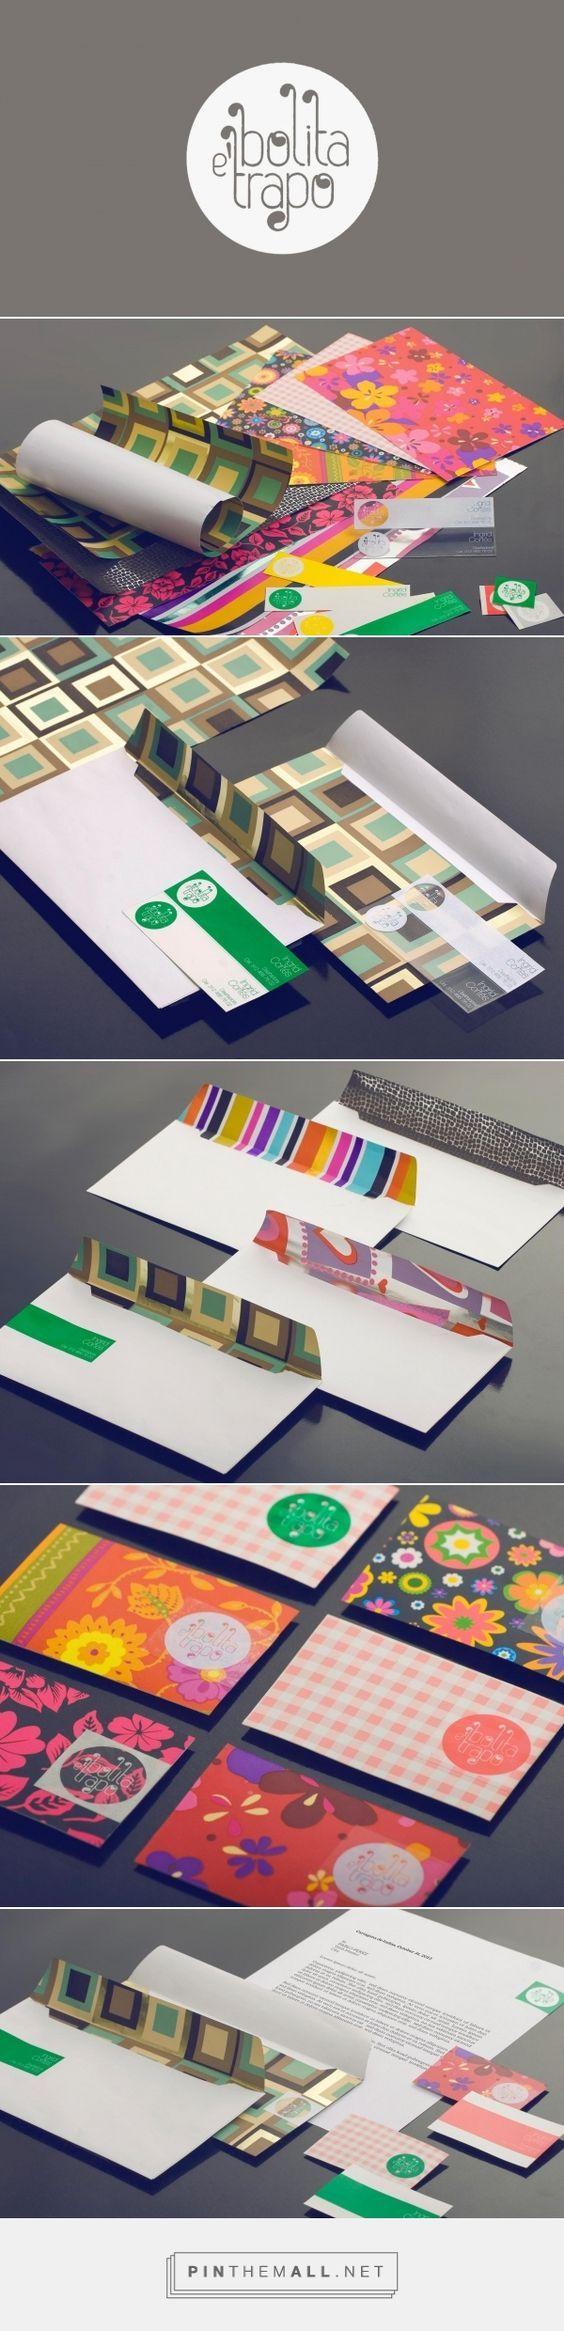 Diseño / marca / logo / identity branding  / color  / visual identity